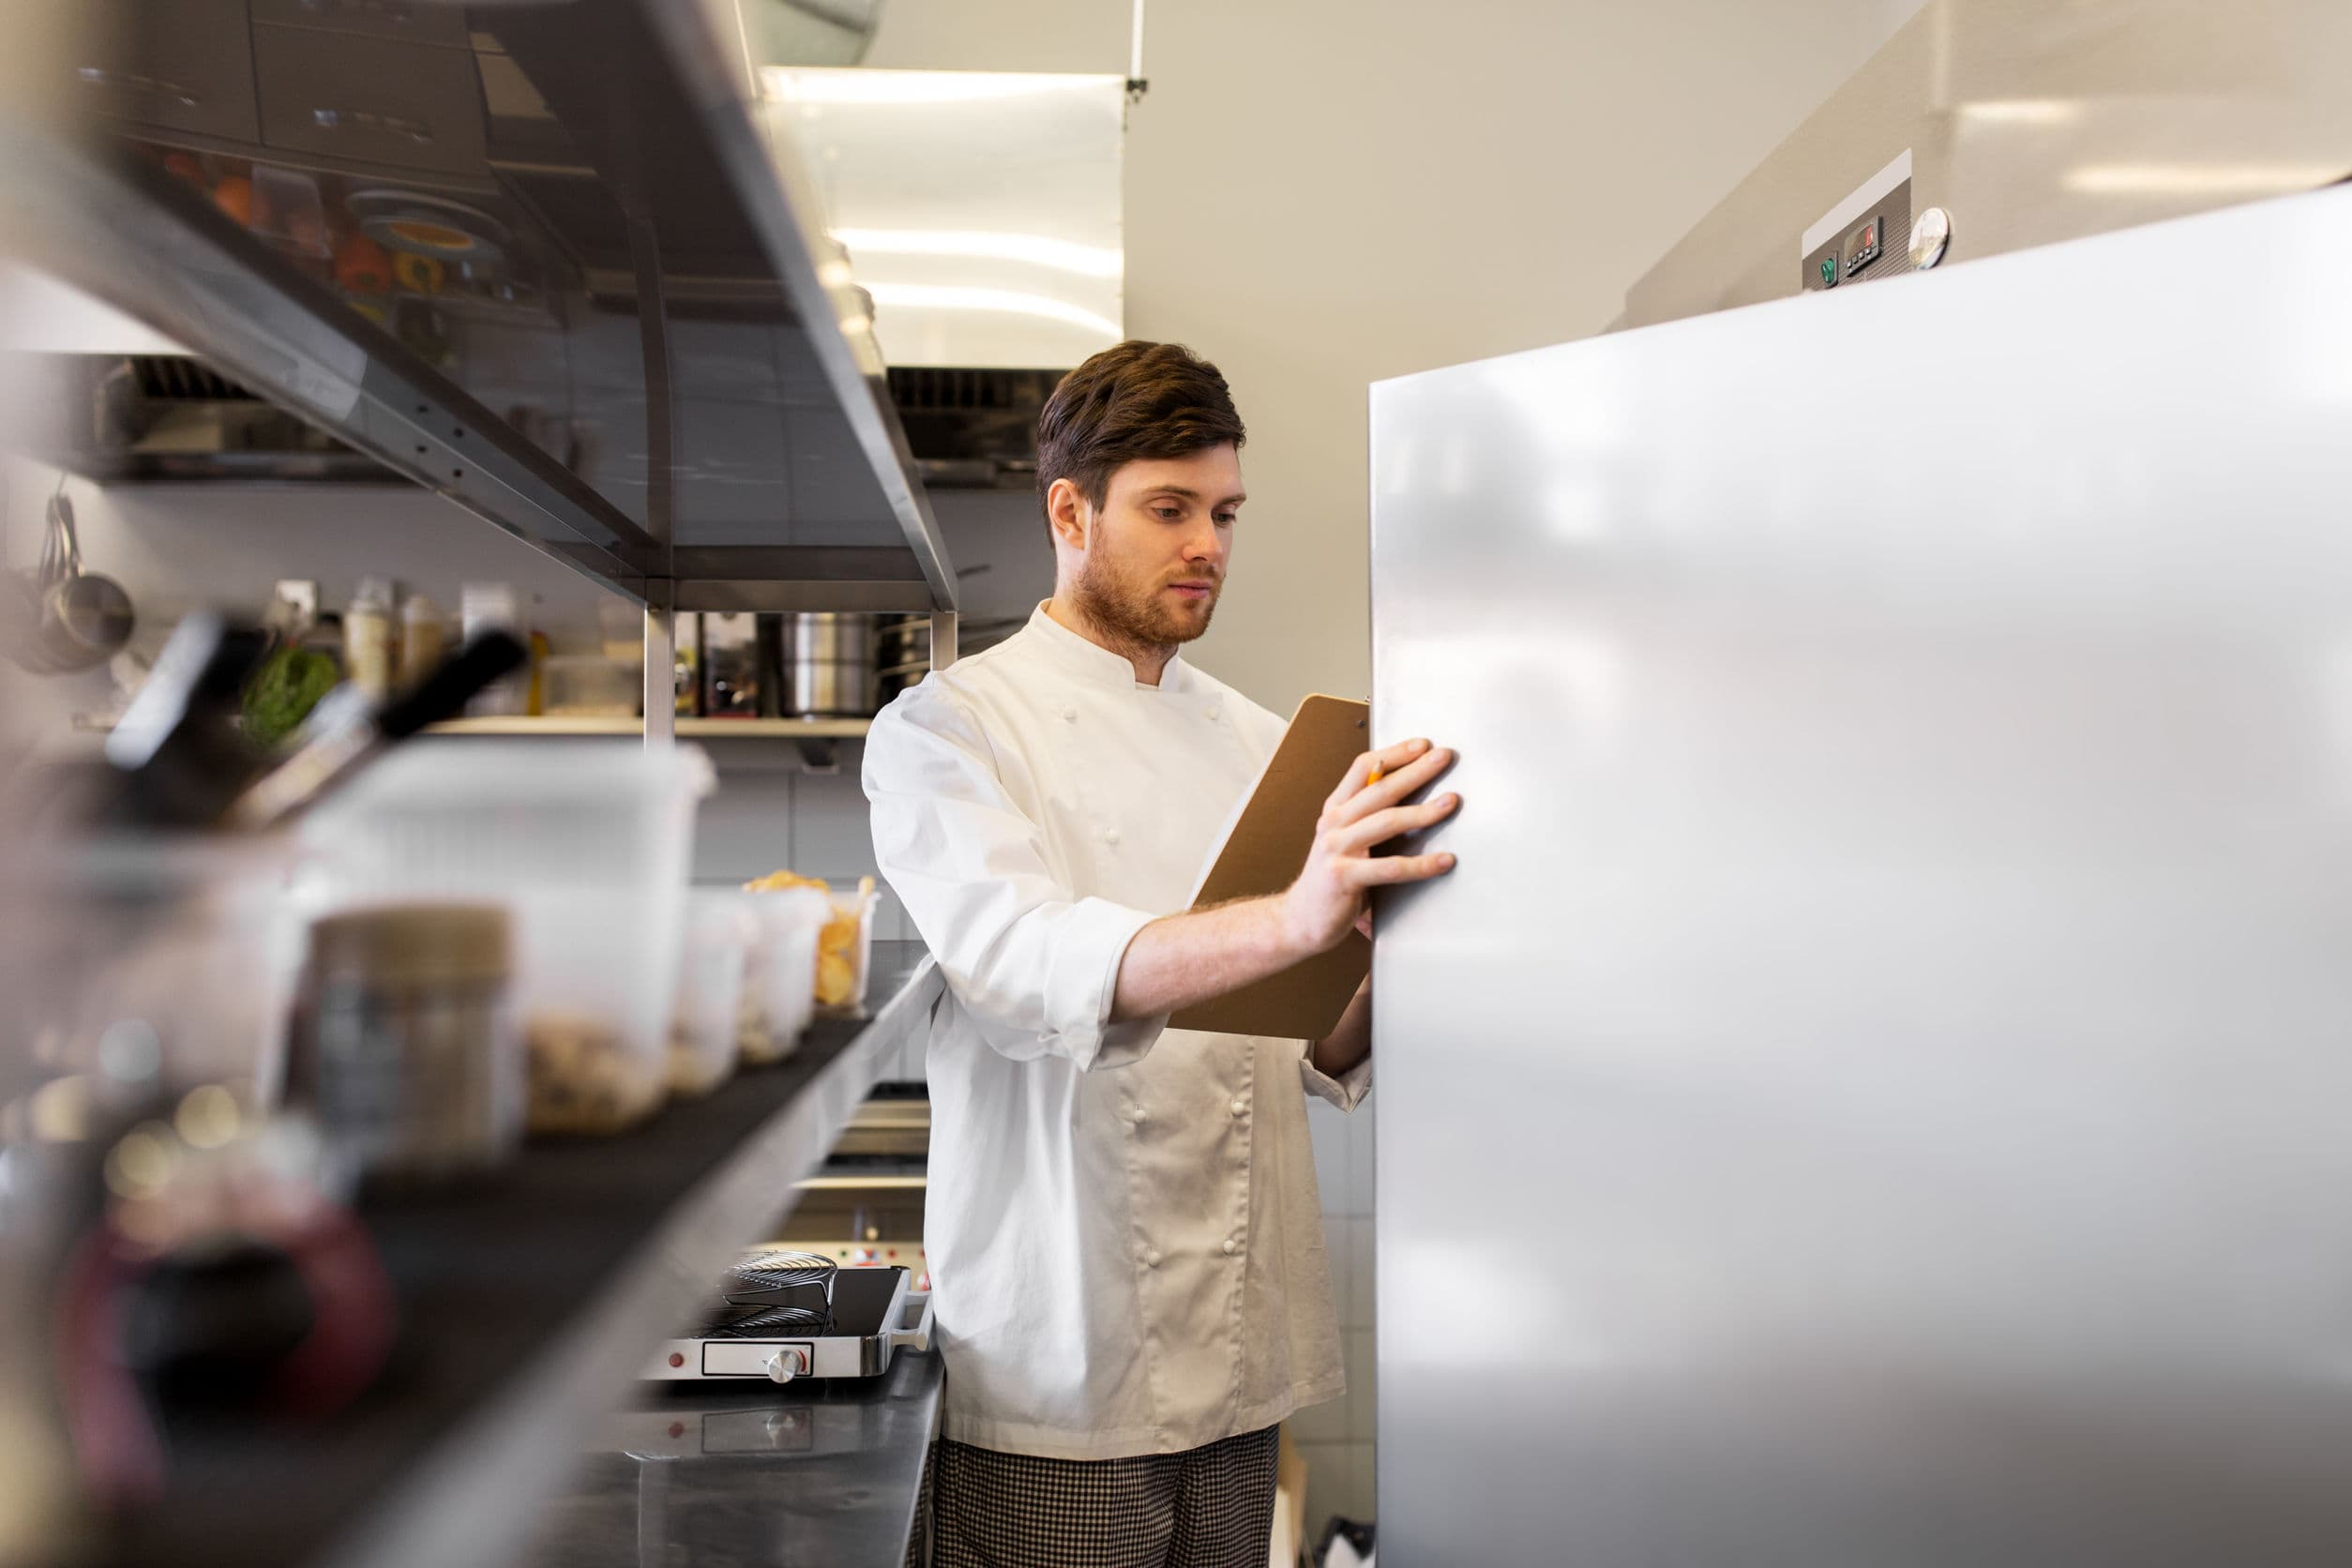 New Restaurants Must Have Proper Refrigeration Equipment